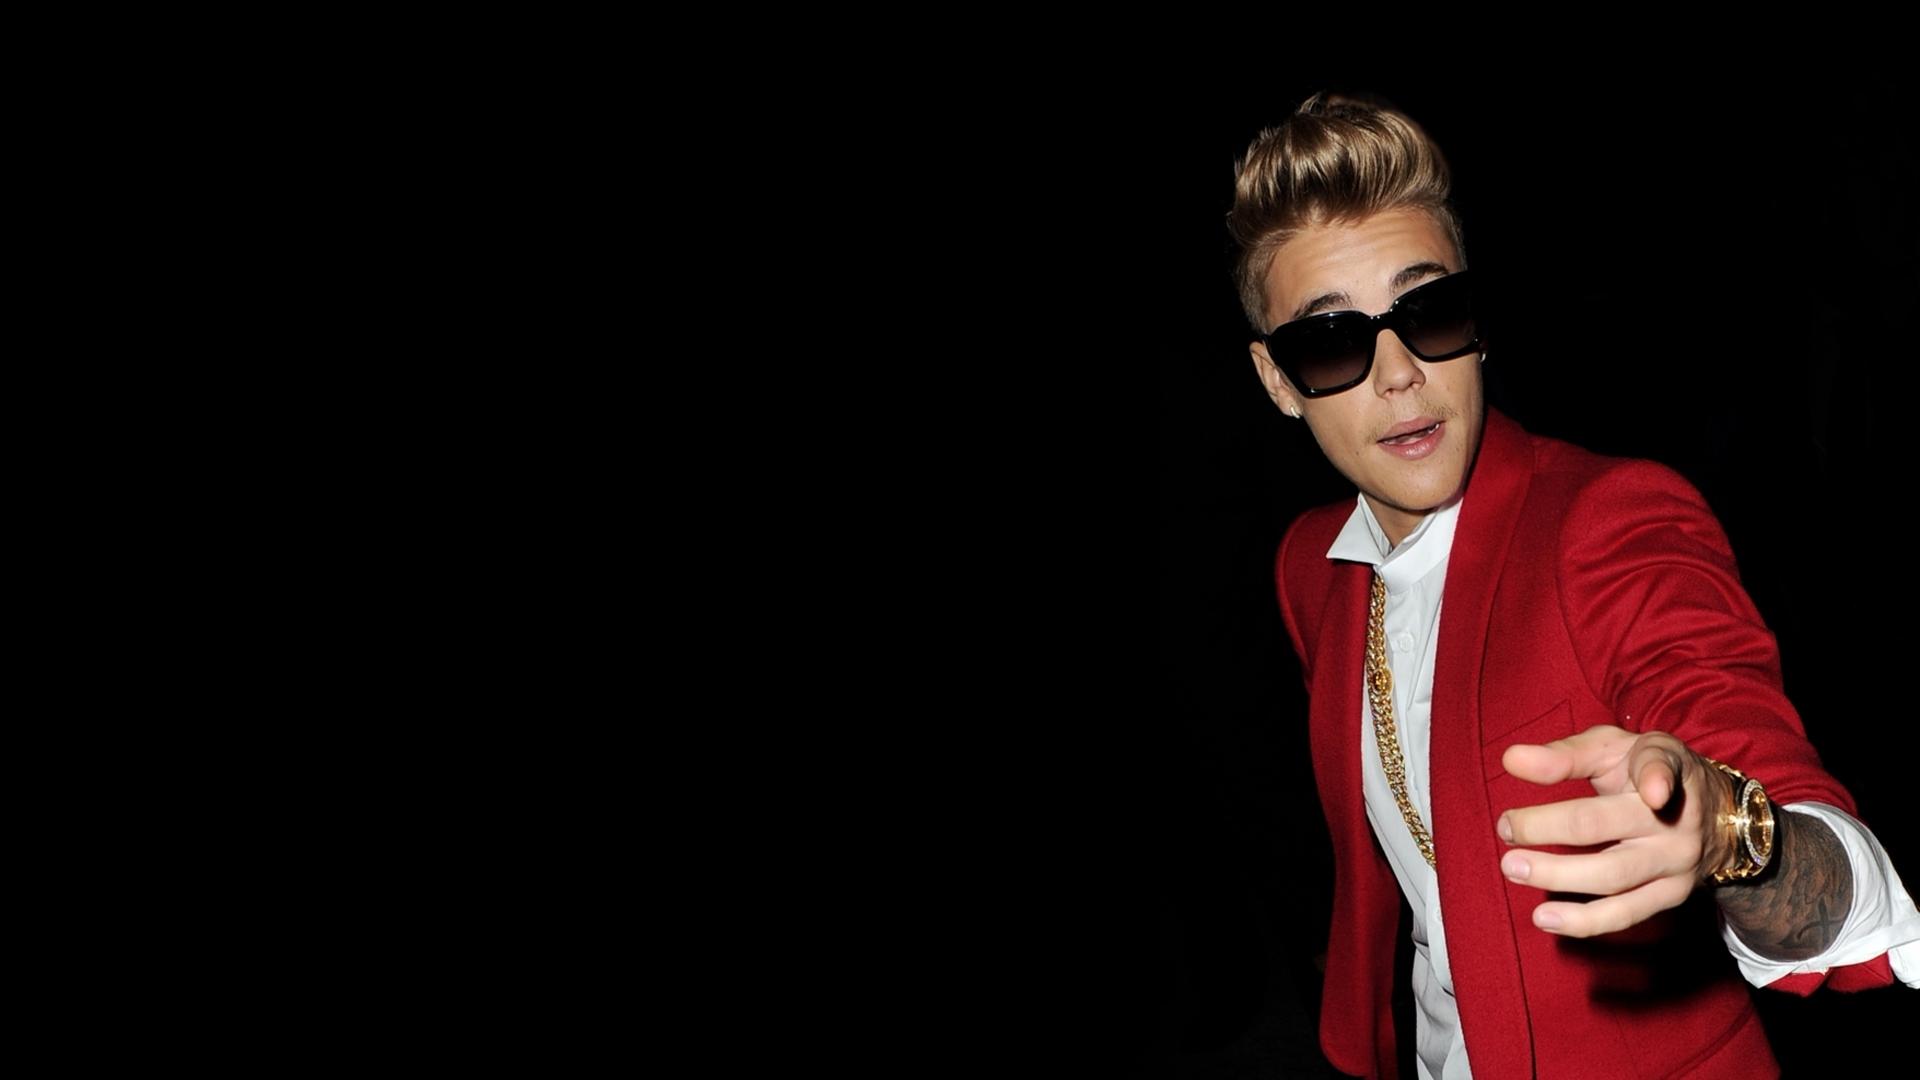 Justin Bieber Singer Cool Glasses wallpaper celebrities 1920x1080